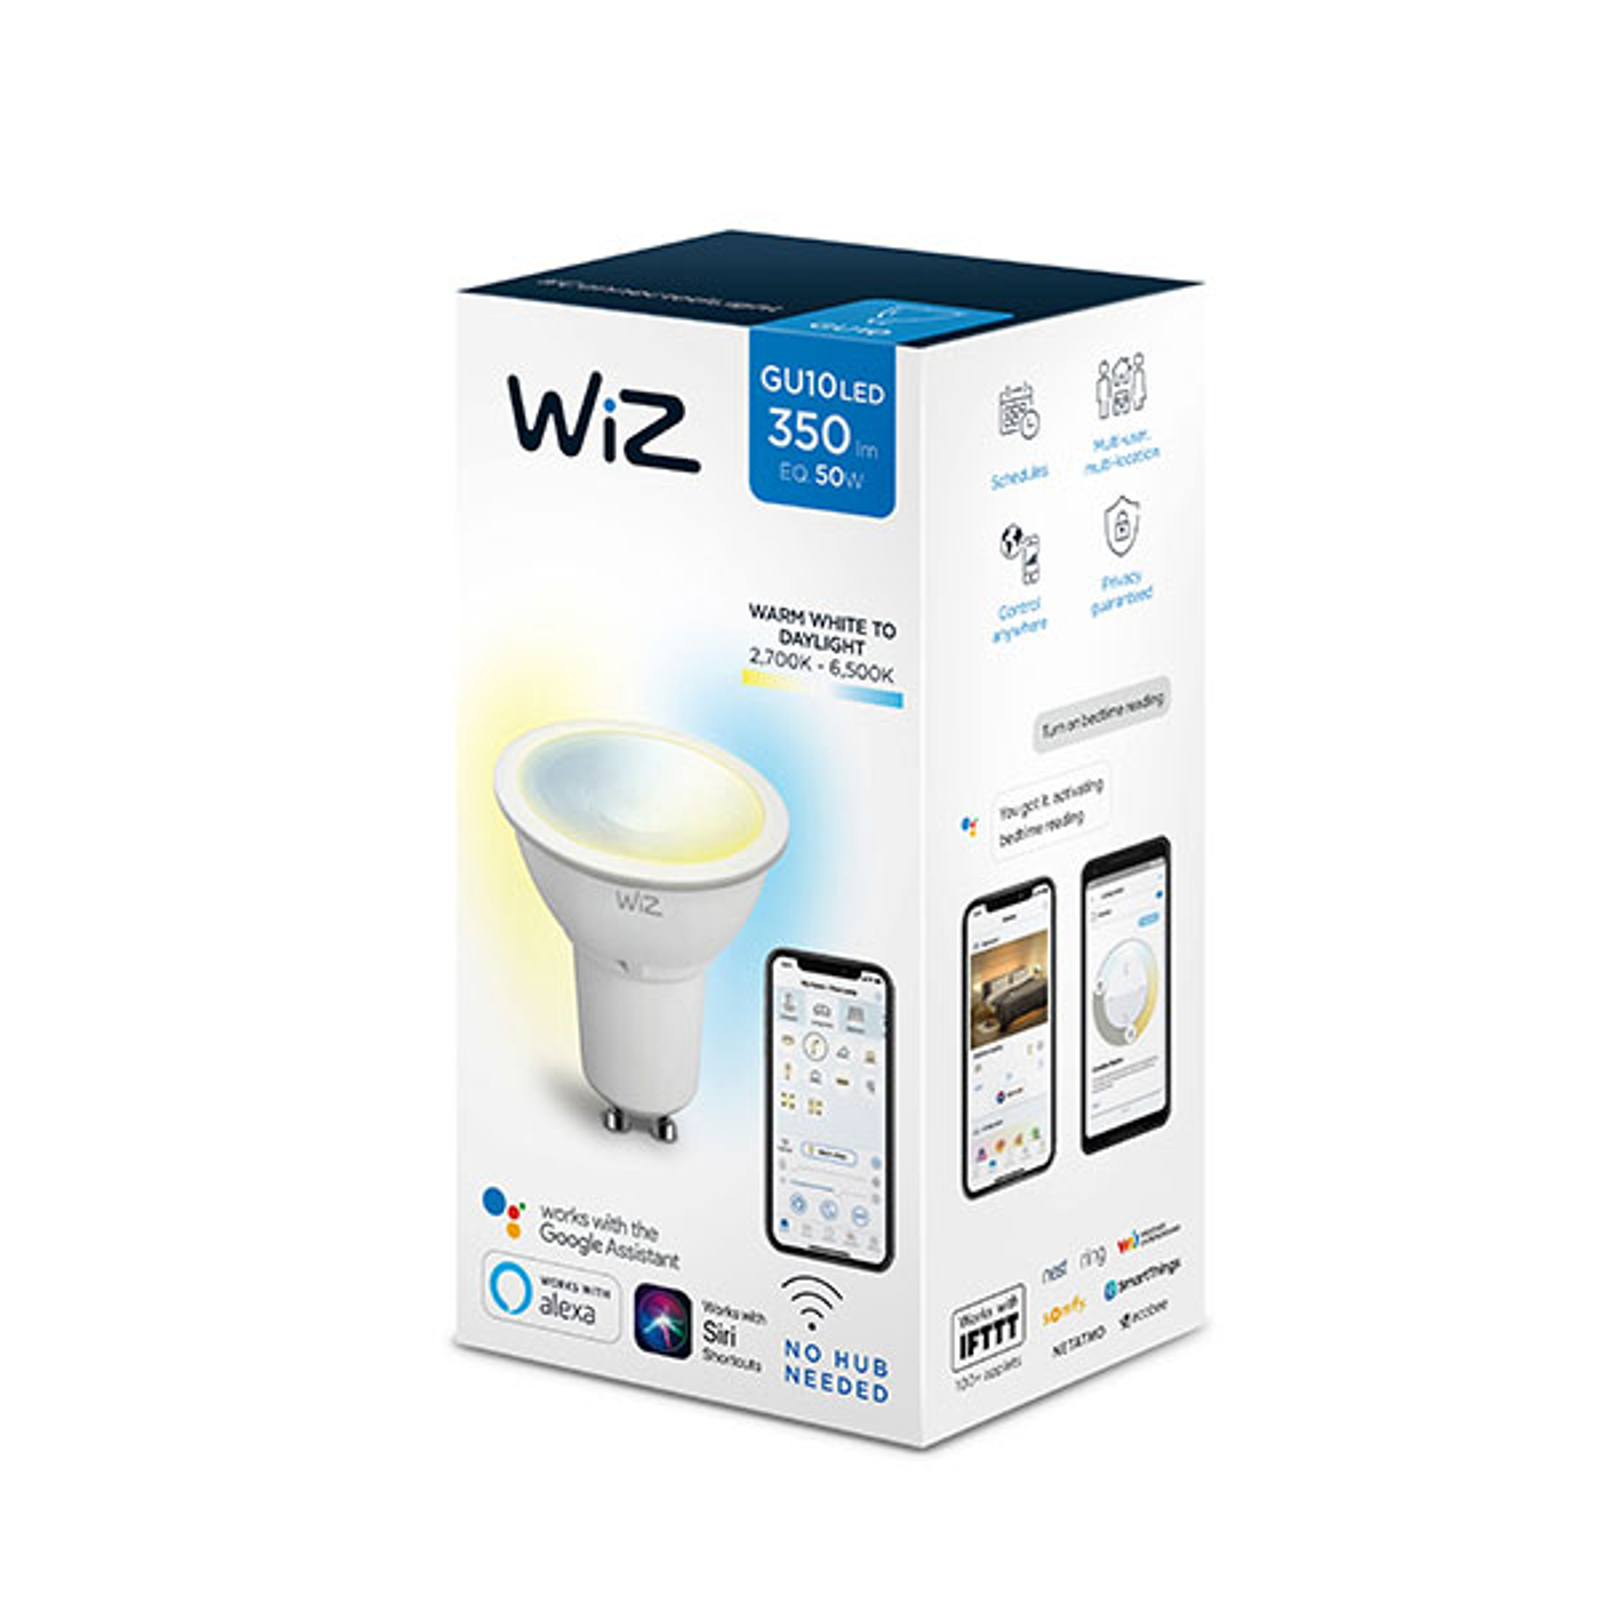 WiZ GU10 LED-Lampe, Ø 5 cm, 5,5 W, 2.700 - 6.500 K